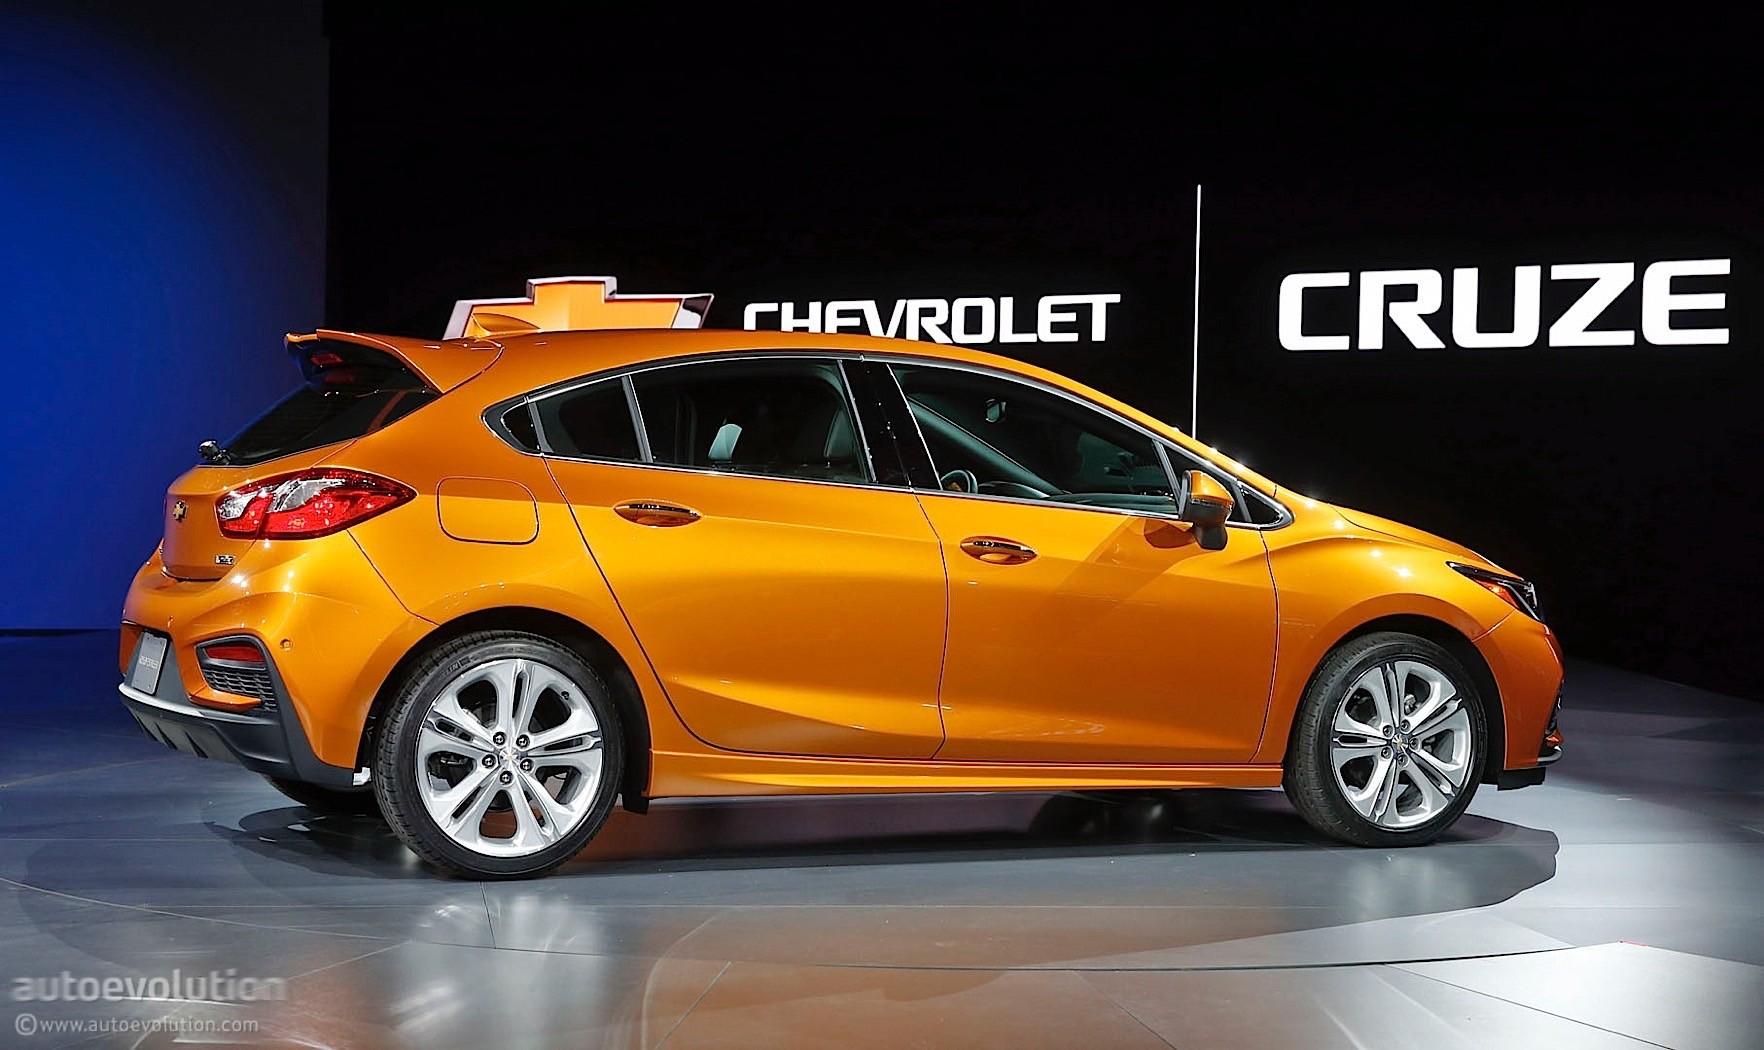 Cruze 2018 India >> 2019 Chevrolet Cruze Gains CVT As Standard, Optional 1.5-liter Turbo Engine - autoevolution